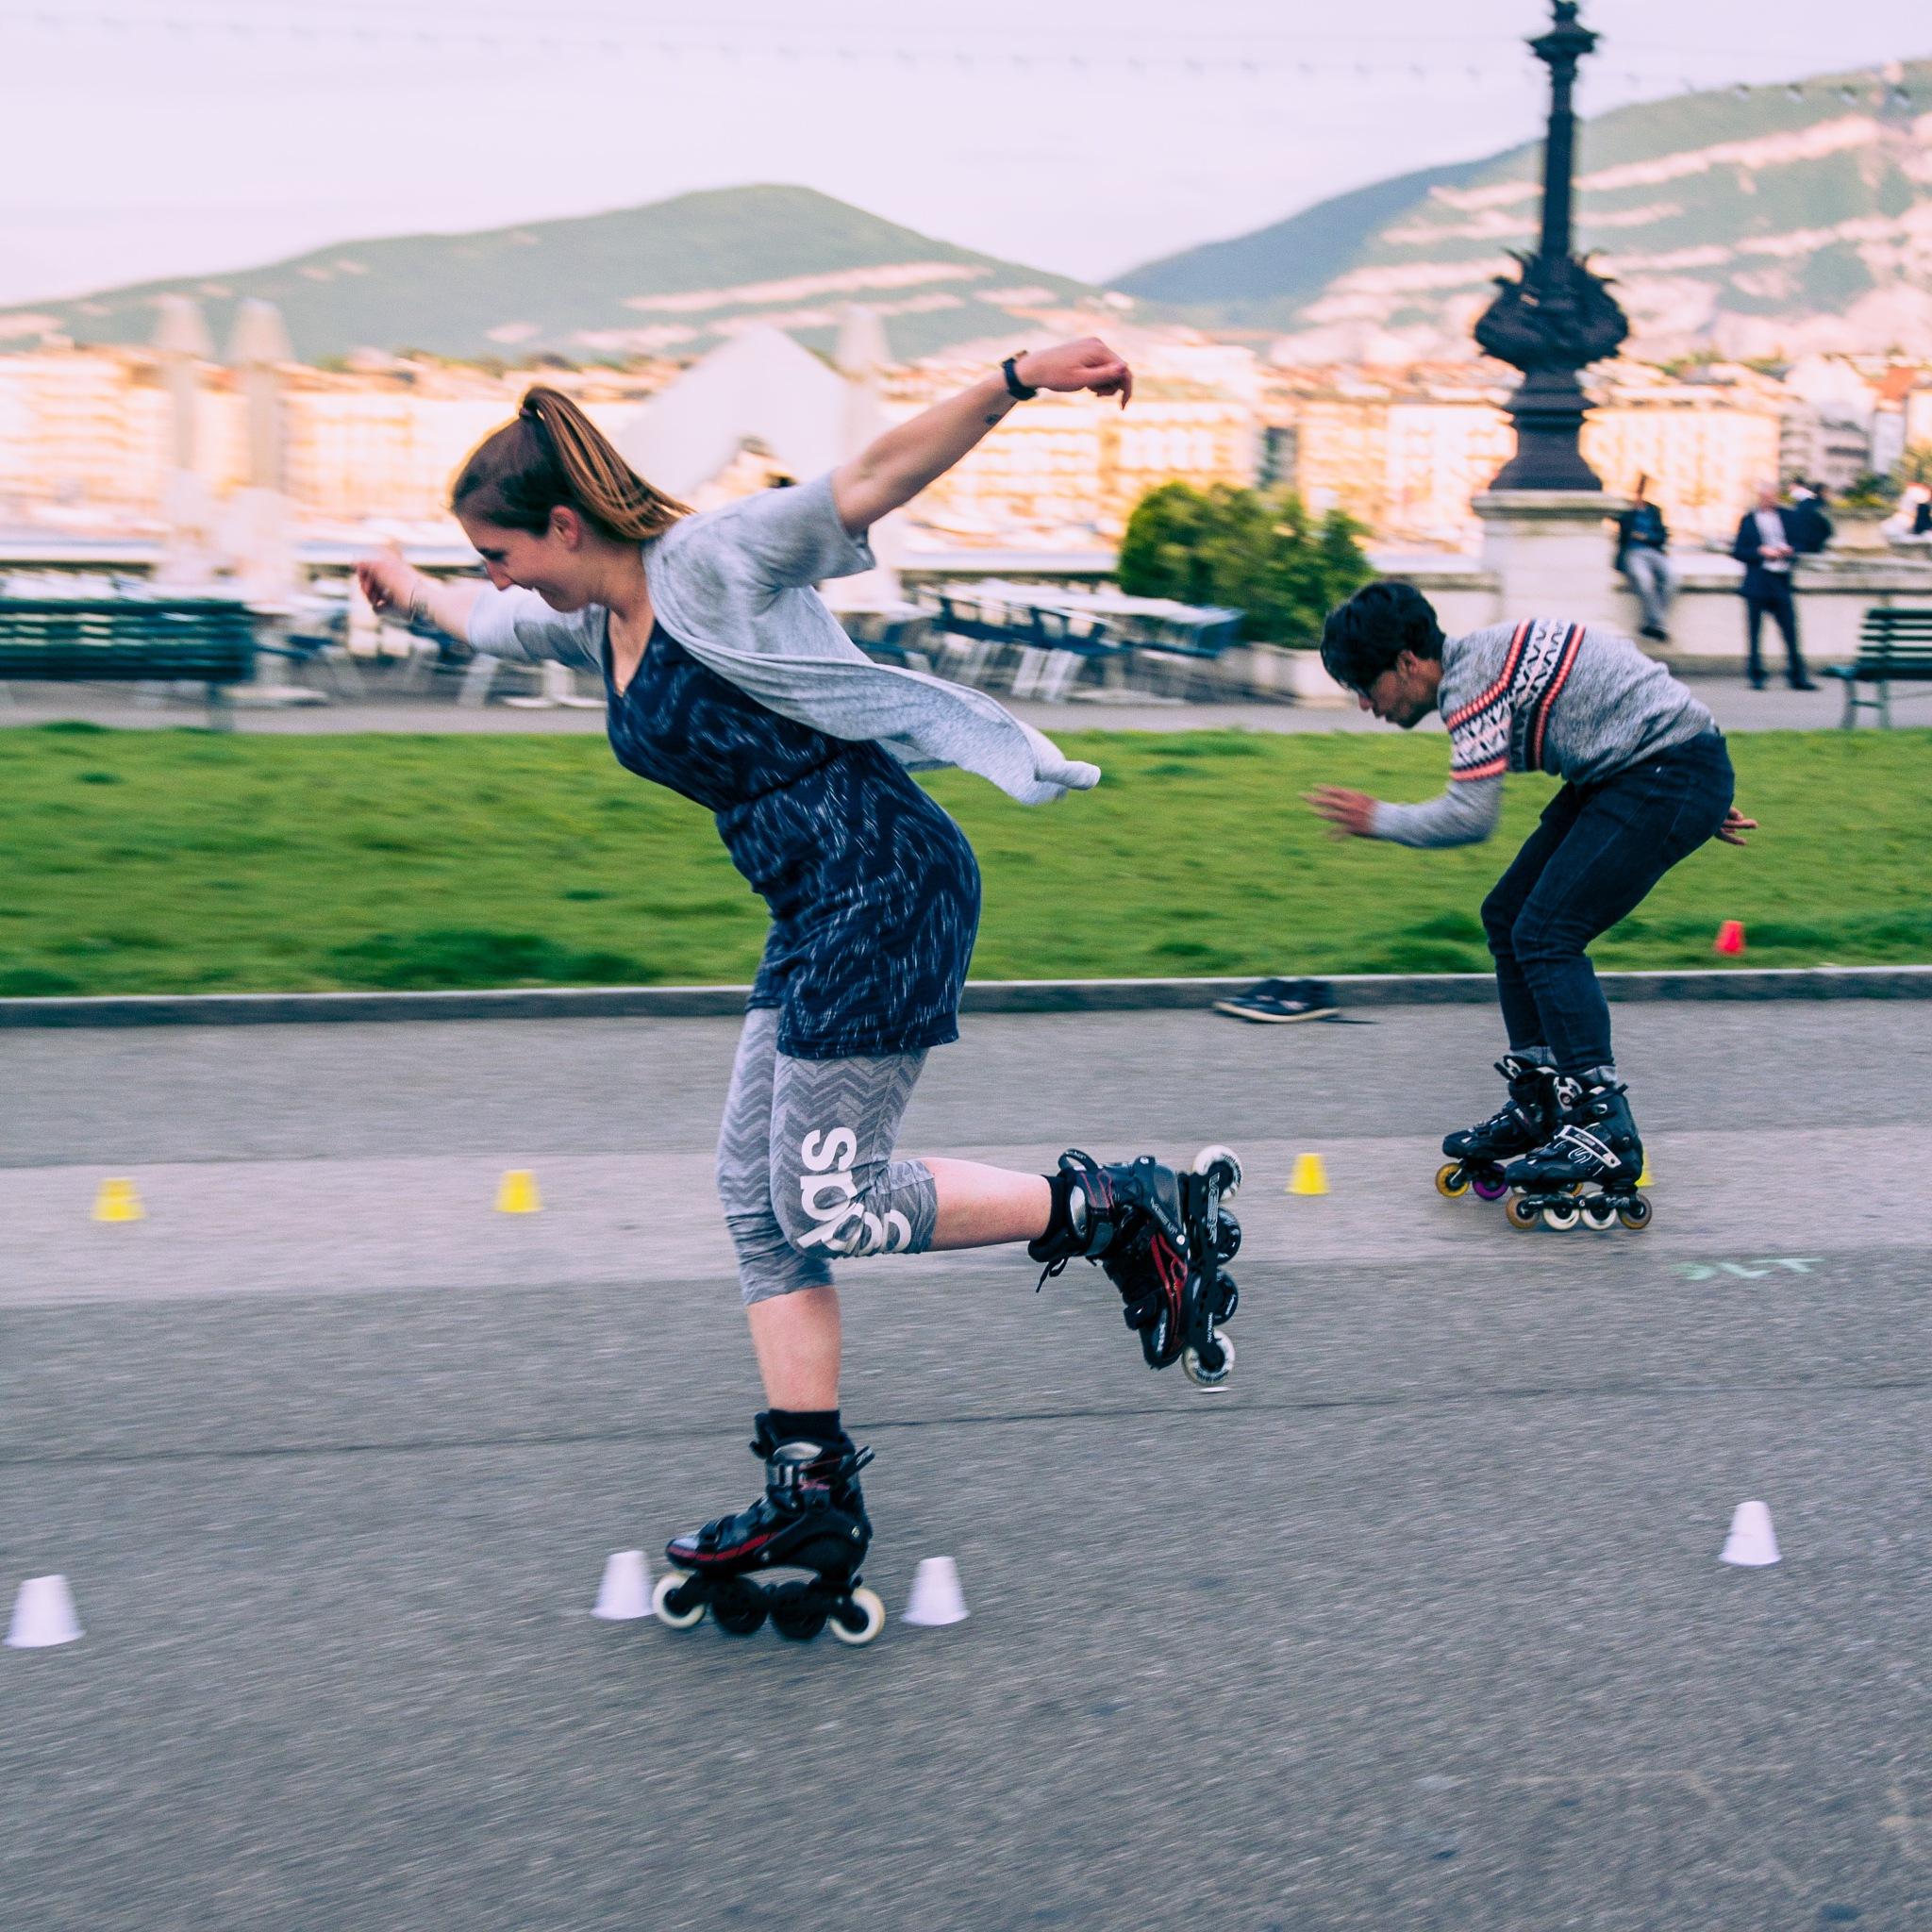 People skating by David Cantos